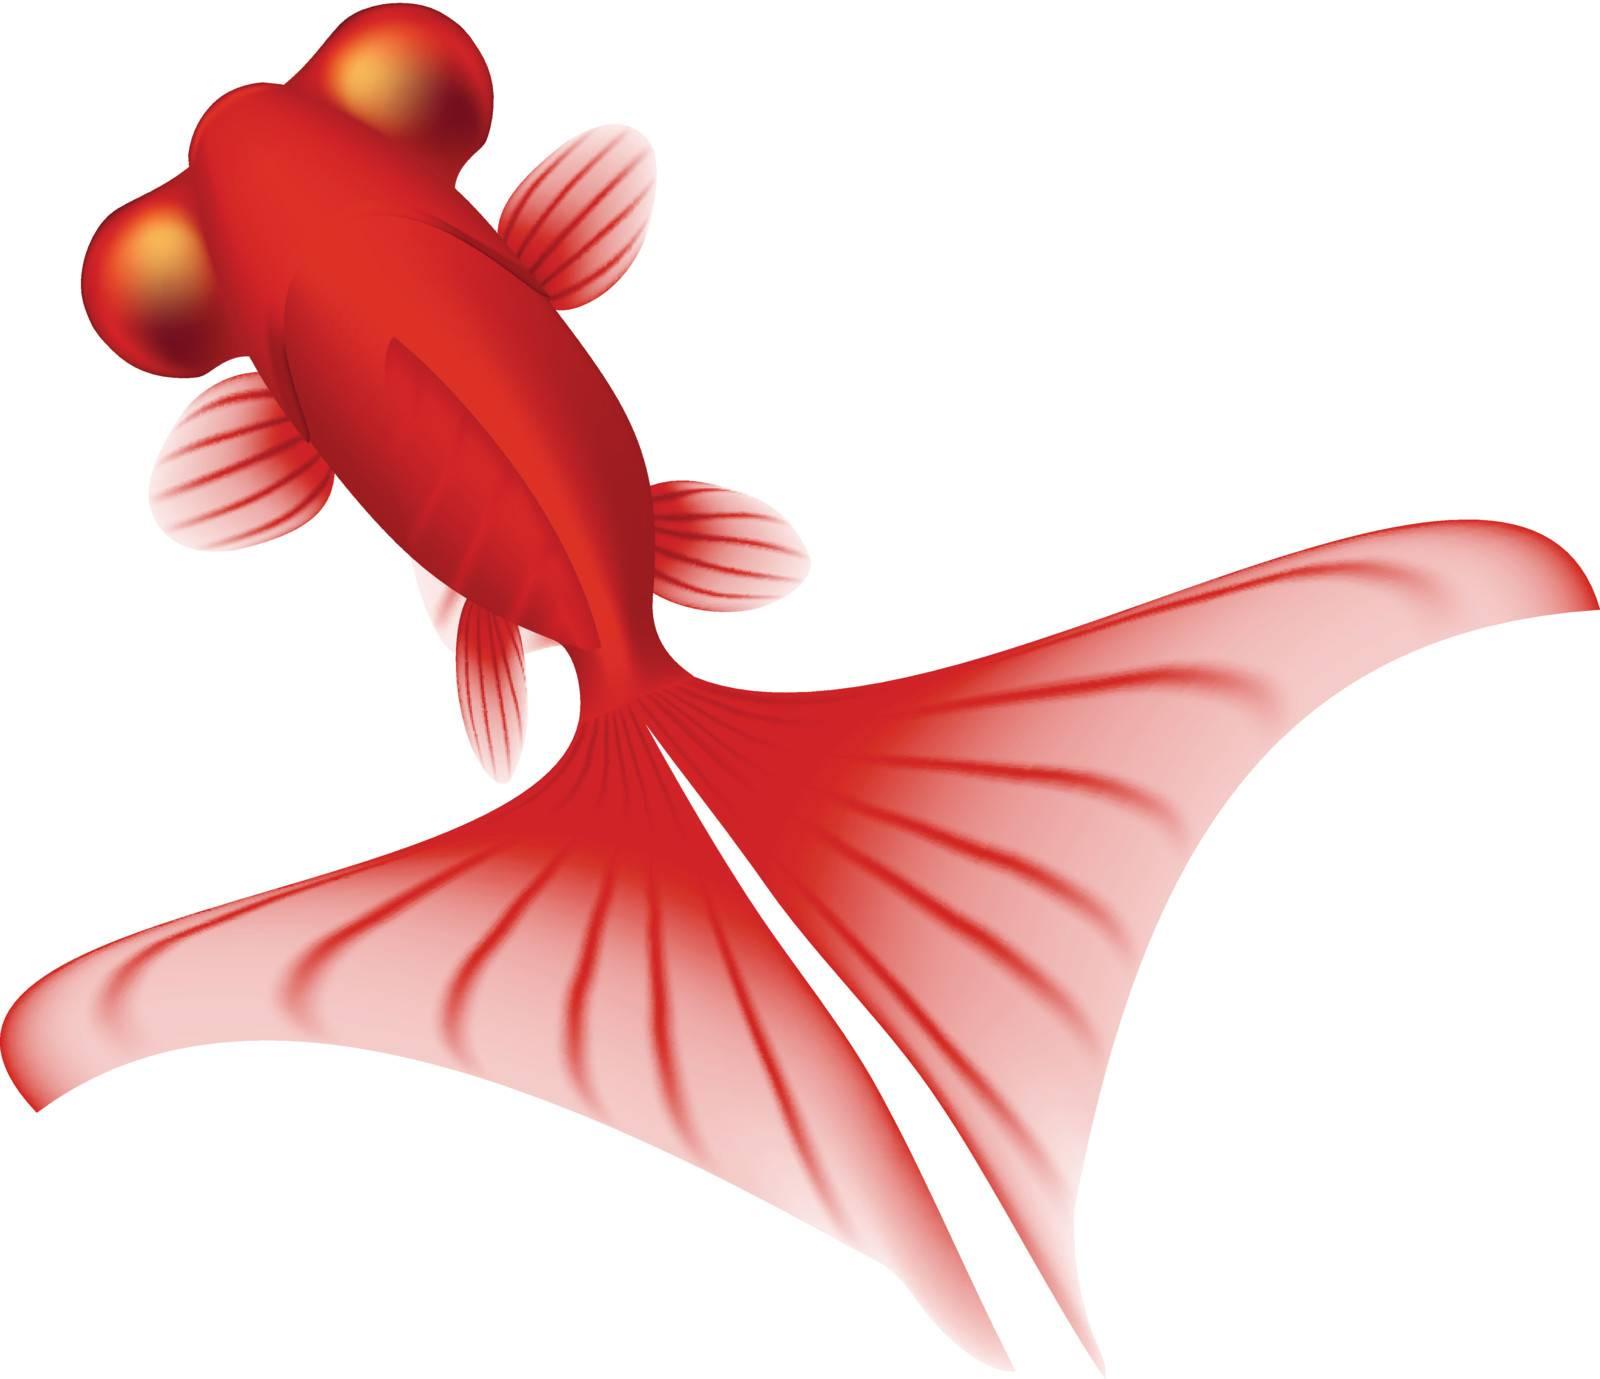 Layered vector illustration of Gold Fish.